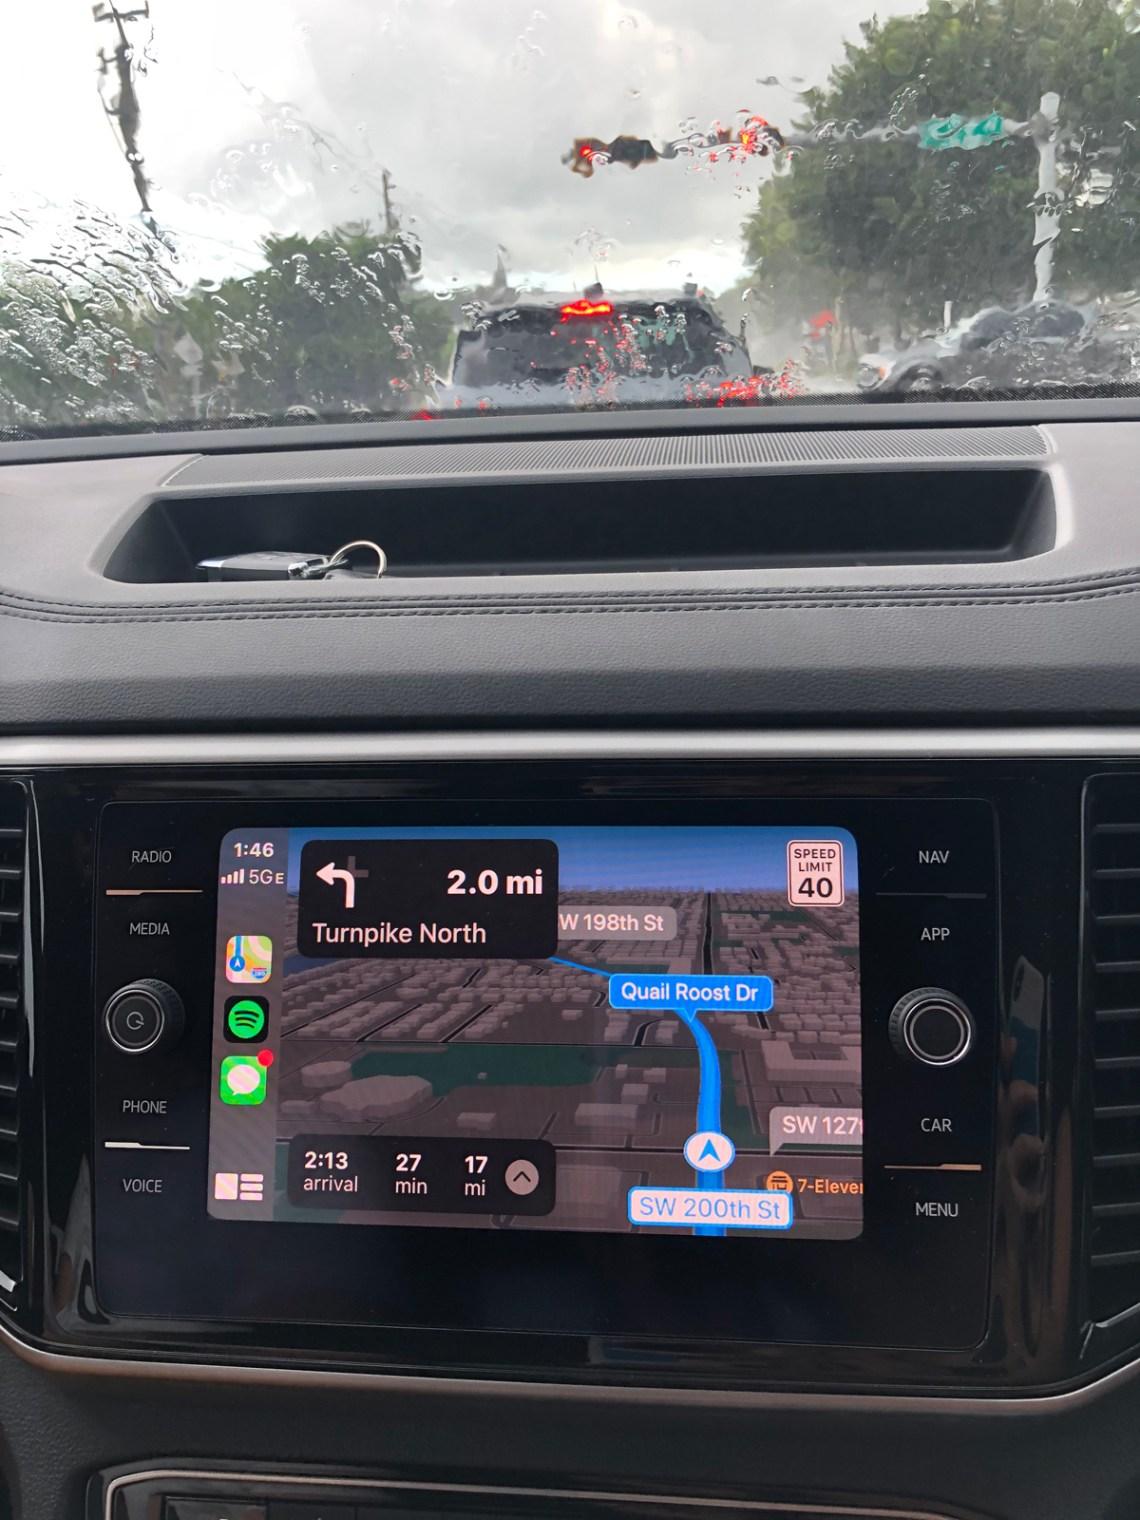 VW Atlas Apple Car Play Navigation Screen in the rain